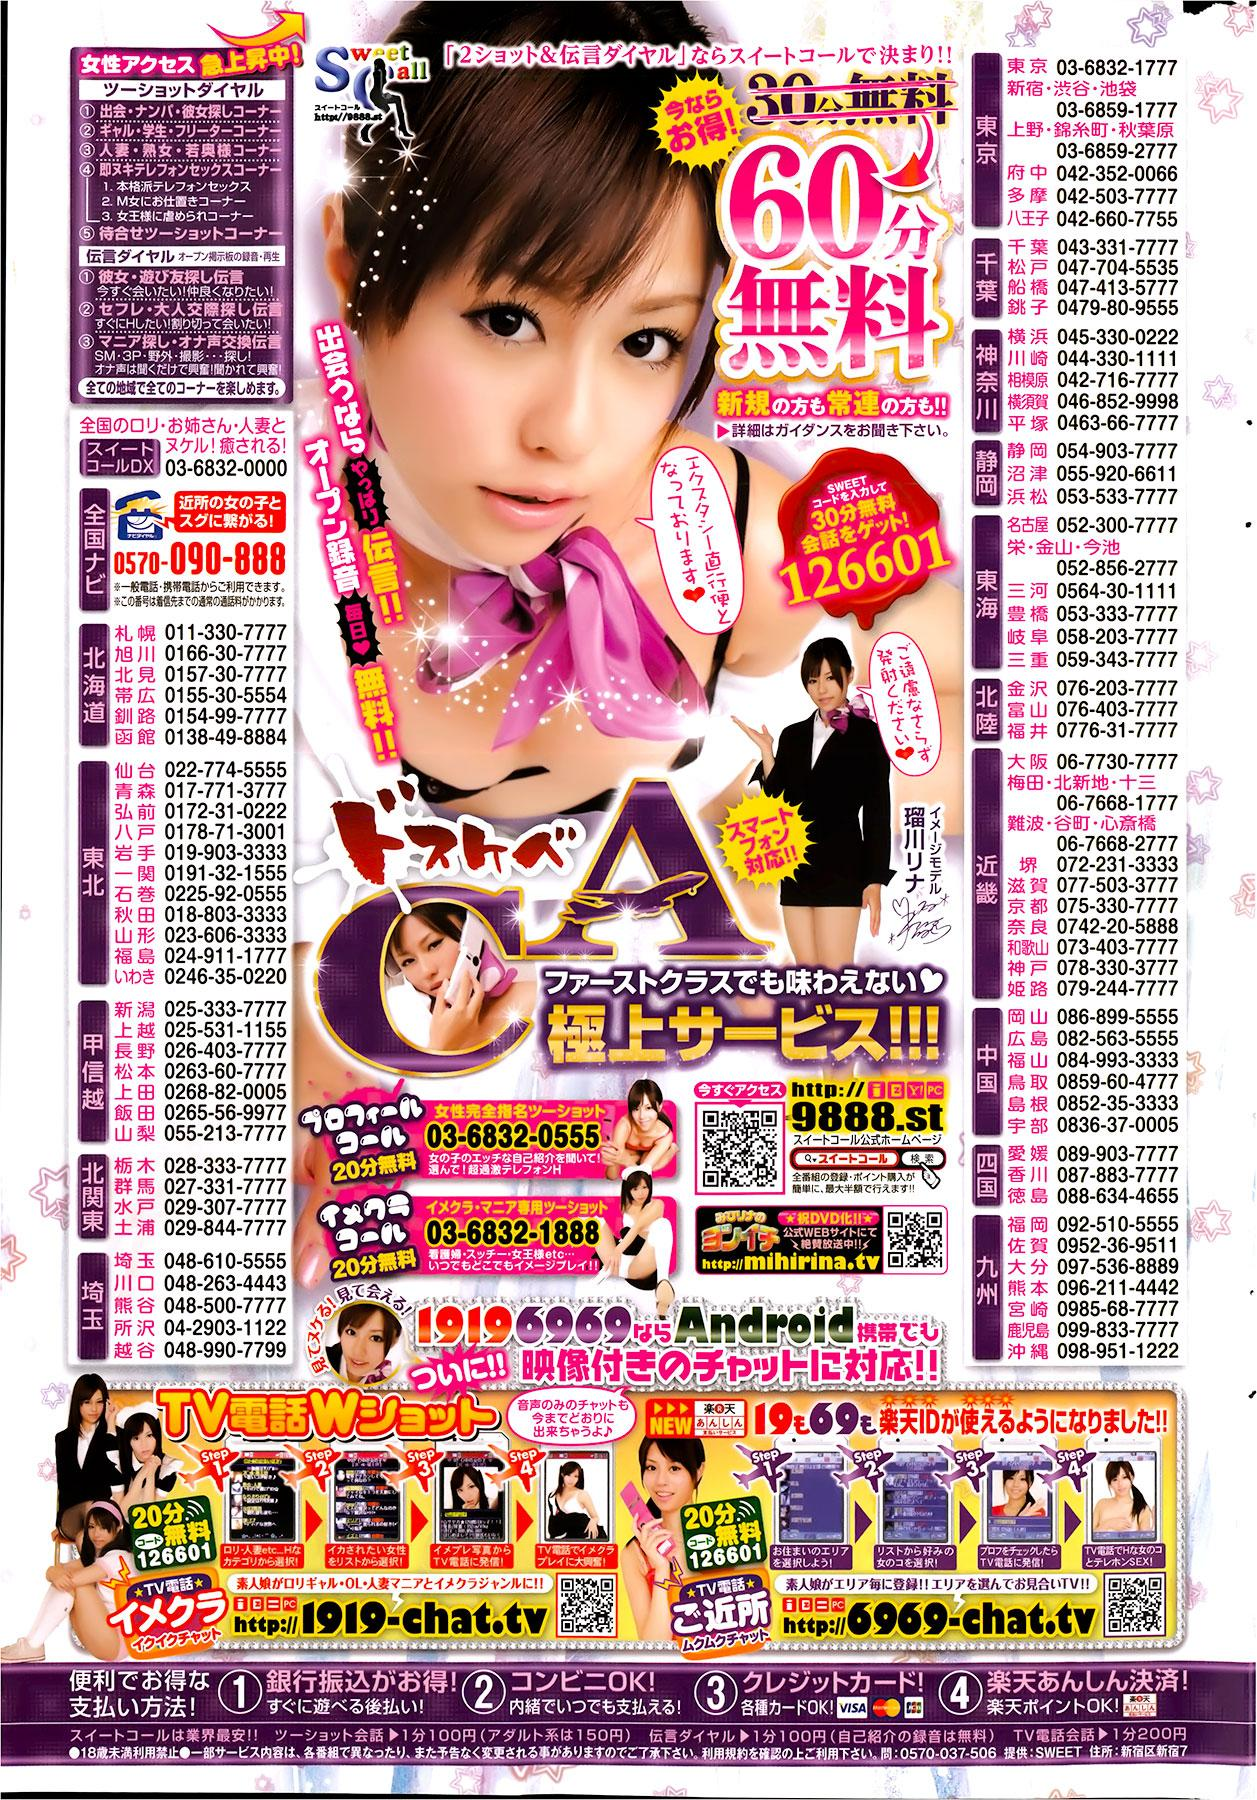 COMIC Penguin Club Sanzokuban 2013-02 238